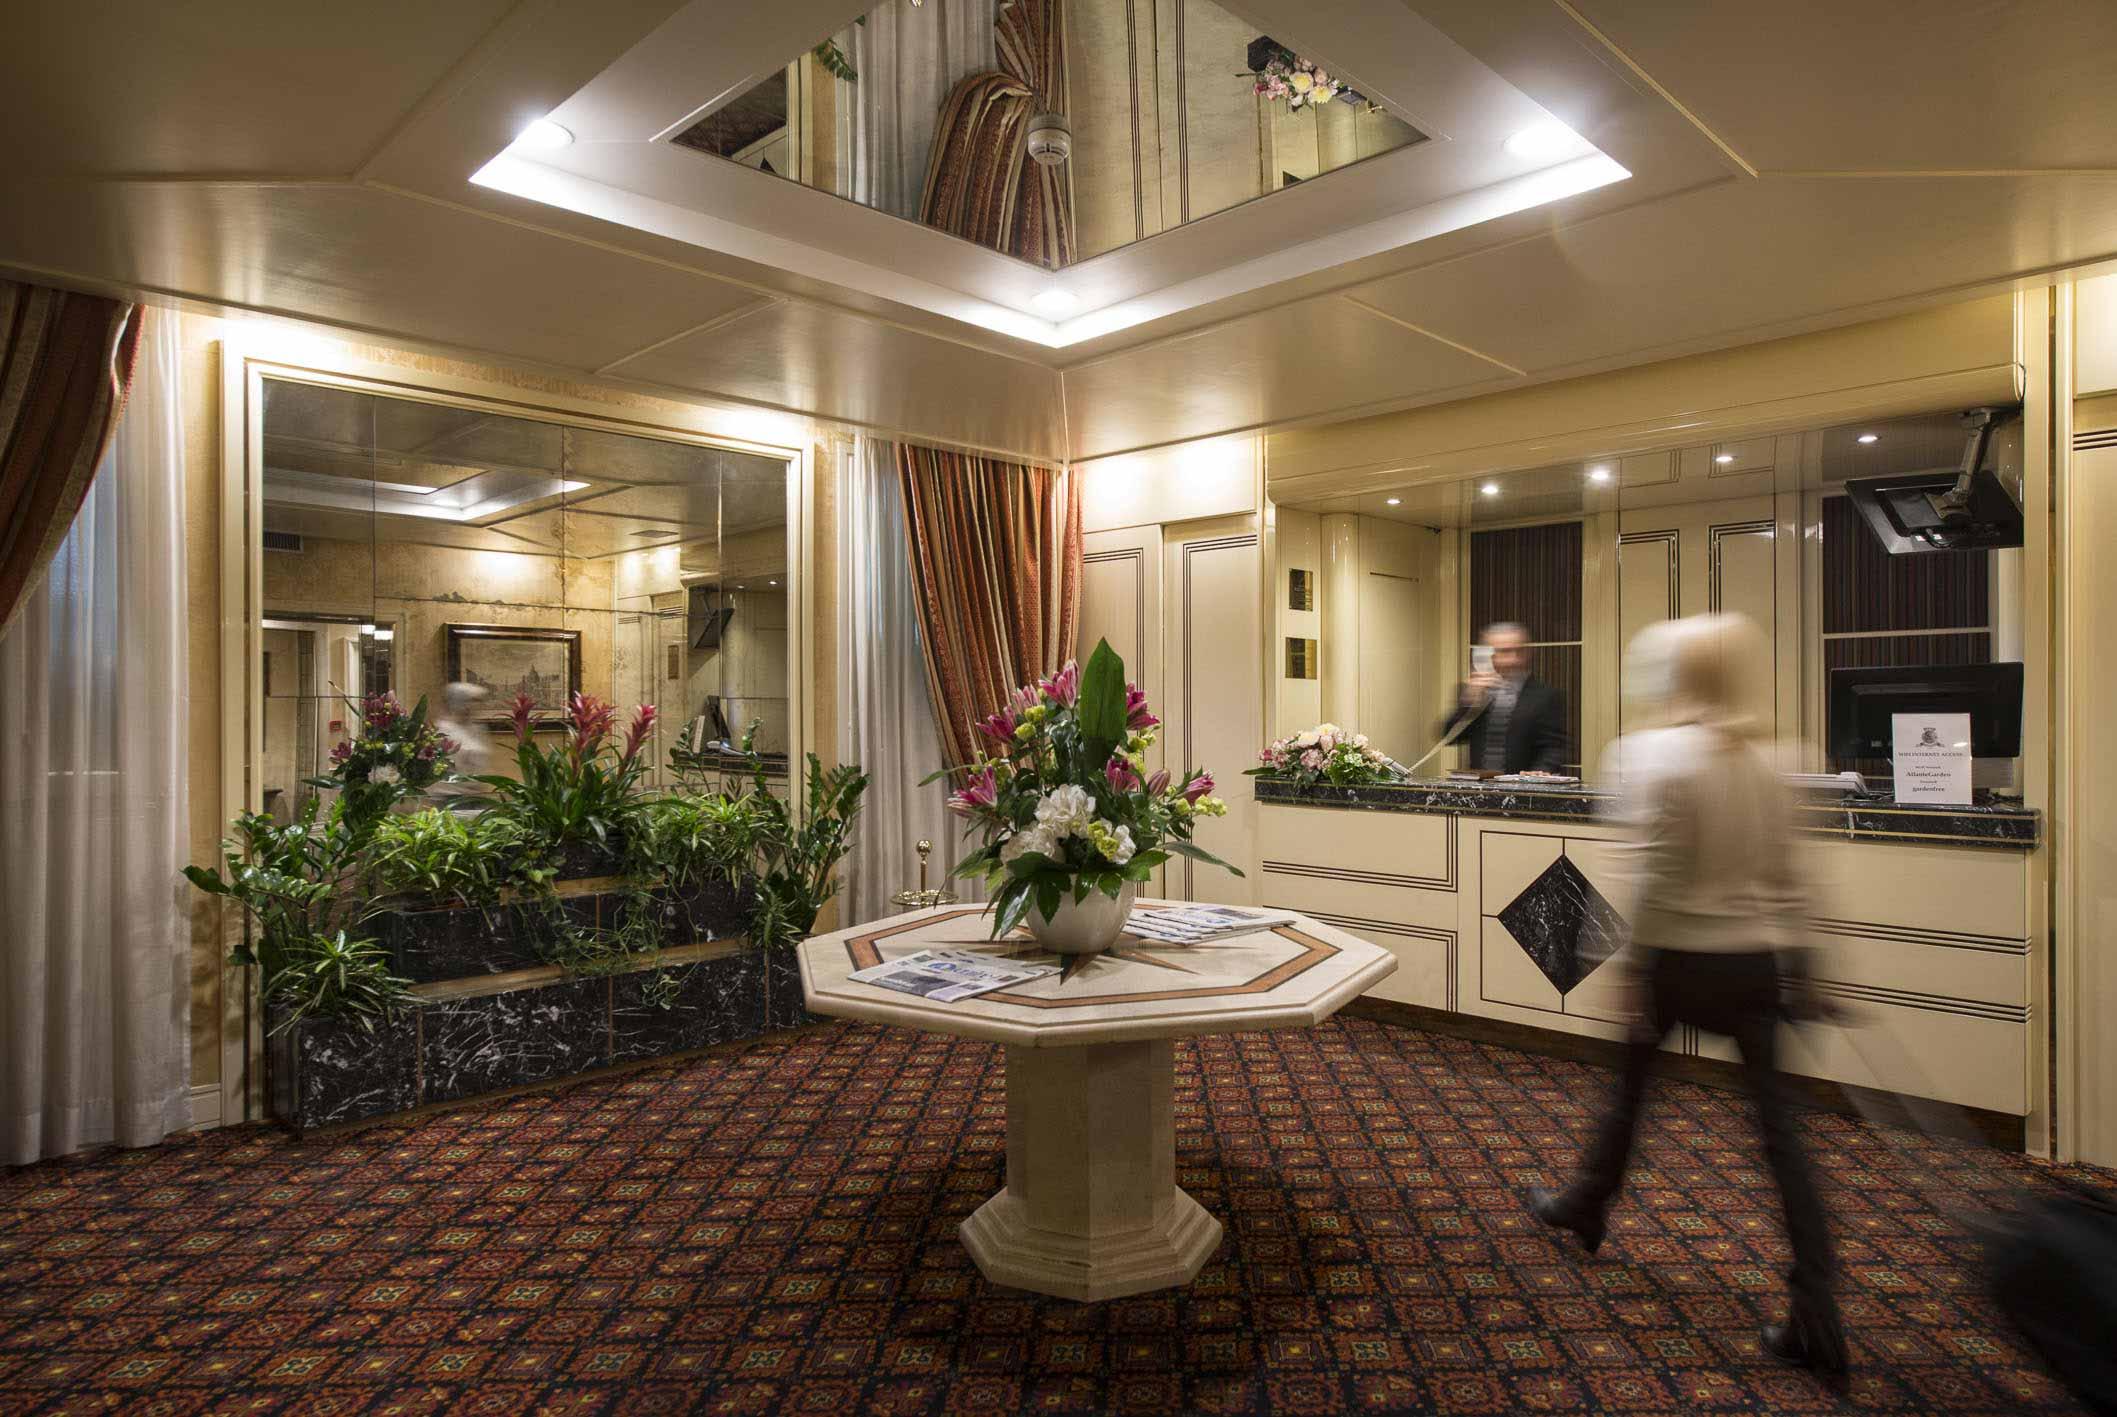 Fotografo per hotel a Roma – Atlante Garden #03